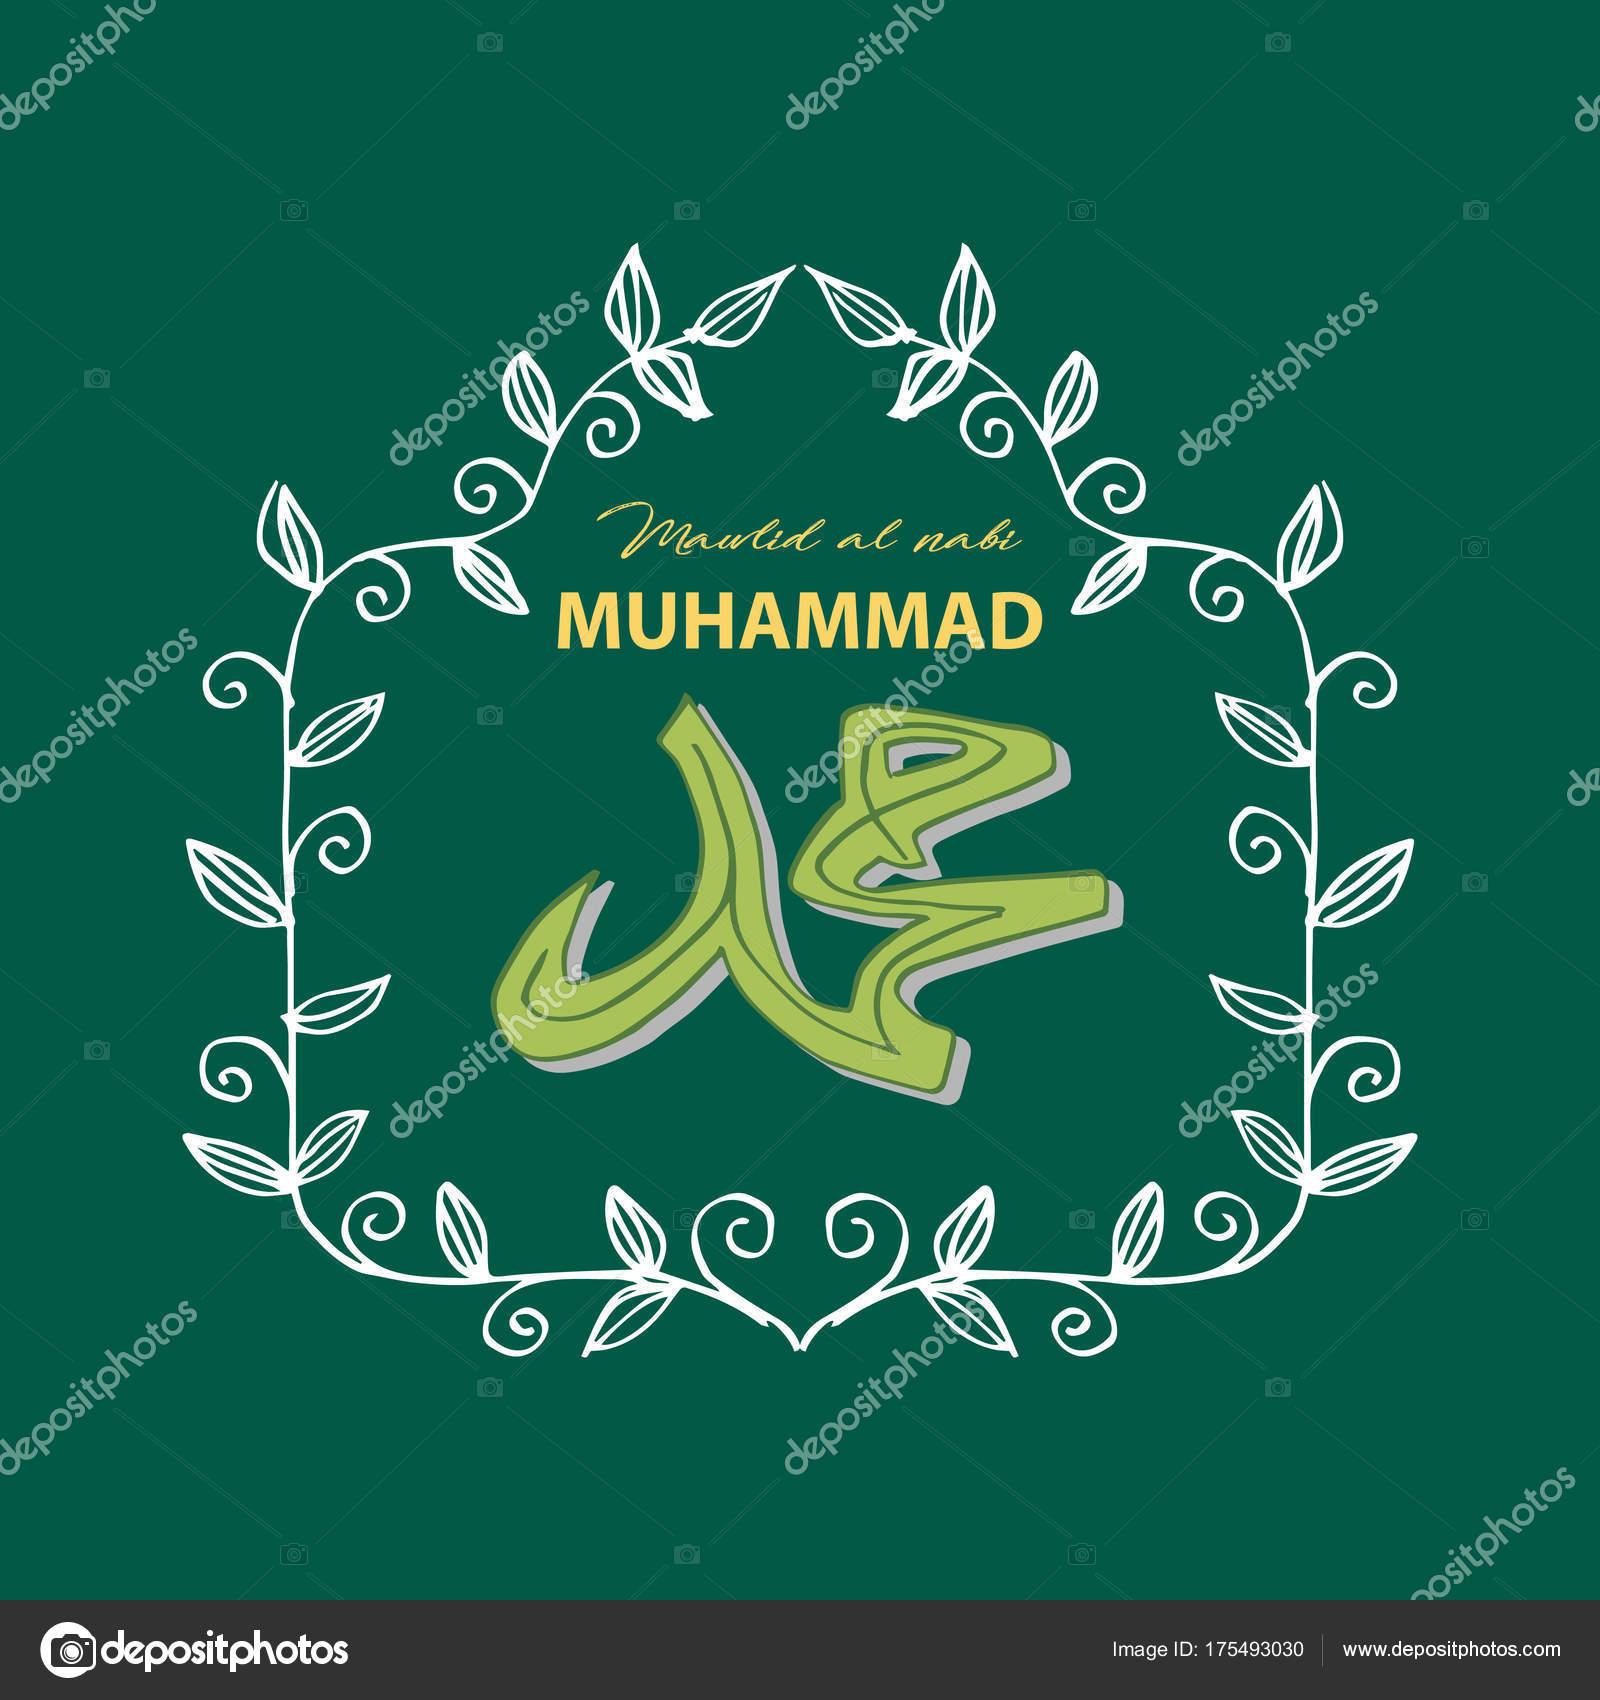 Mawlid Prophet Muhammad Islamic Greeting Card Stock Photo